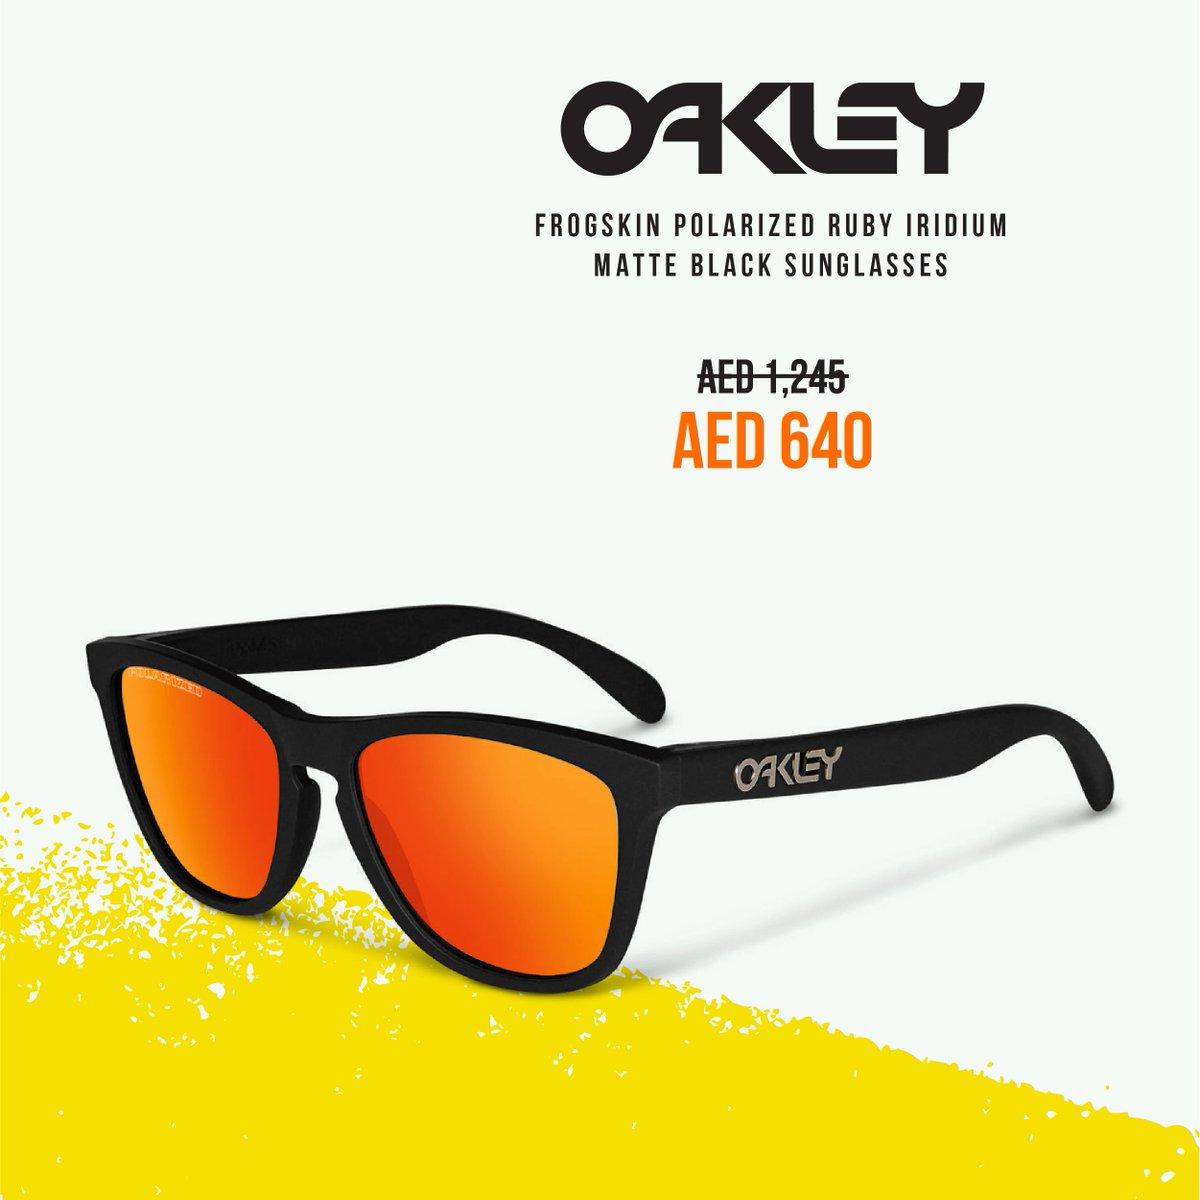 d86d984276 ...  summer... https   www.whoopey.com lifestyle woman eyewear oakley -frogskin-polarized-ruby-iridium-55-17-matte-black-sunglasses-ok-9013-24-402 -55.html … ...